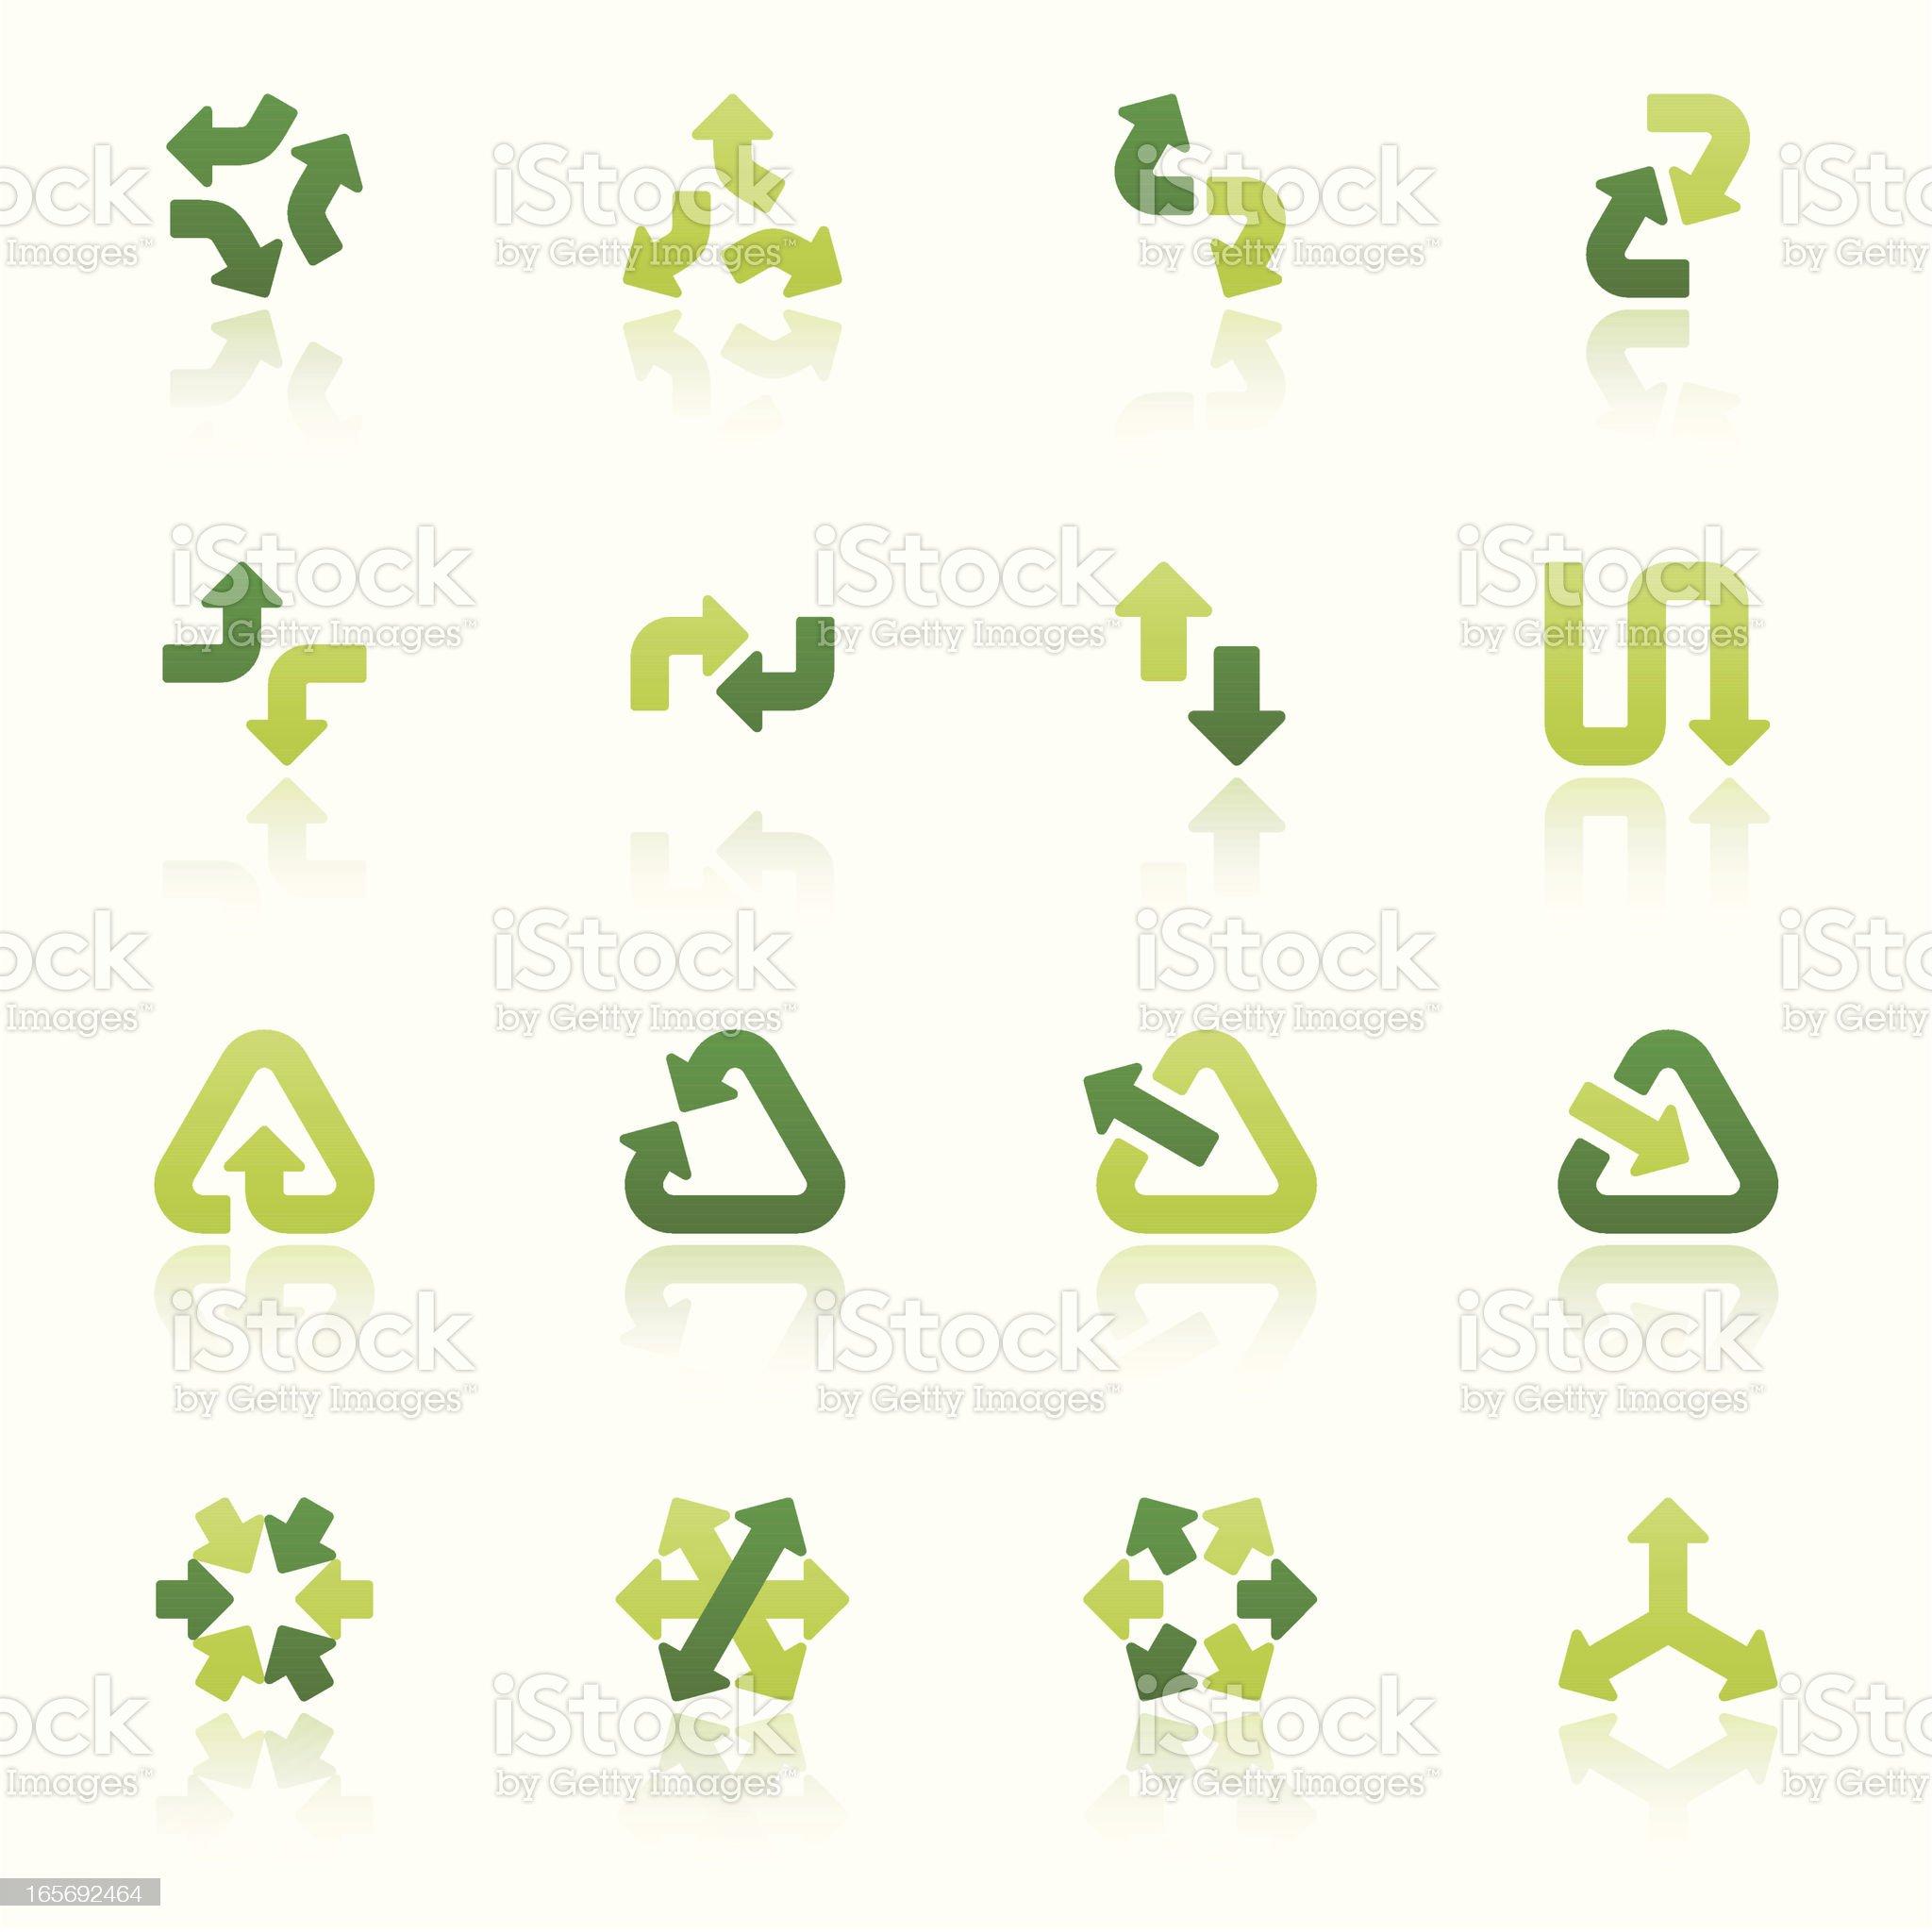 arrow signs icon set III fresh reflection royalty-free stock vector art